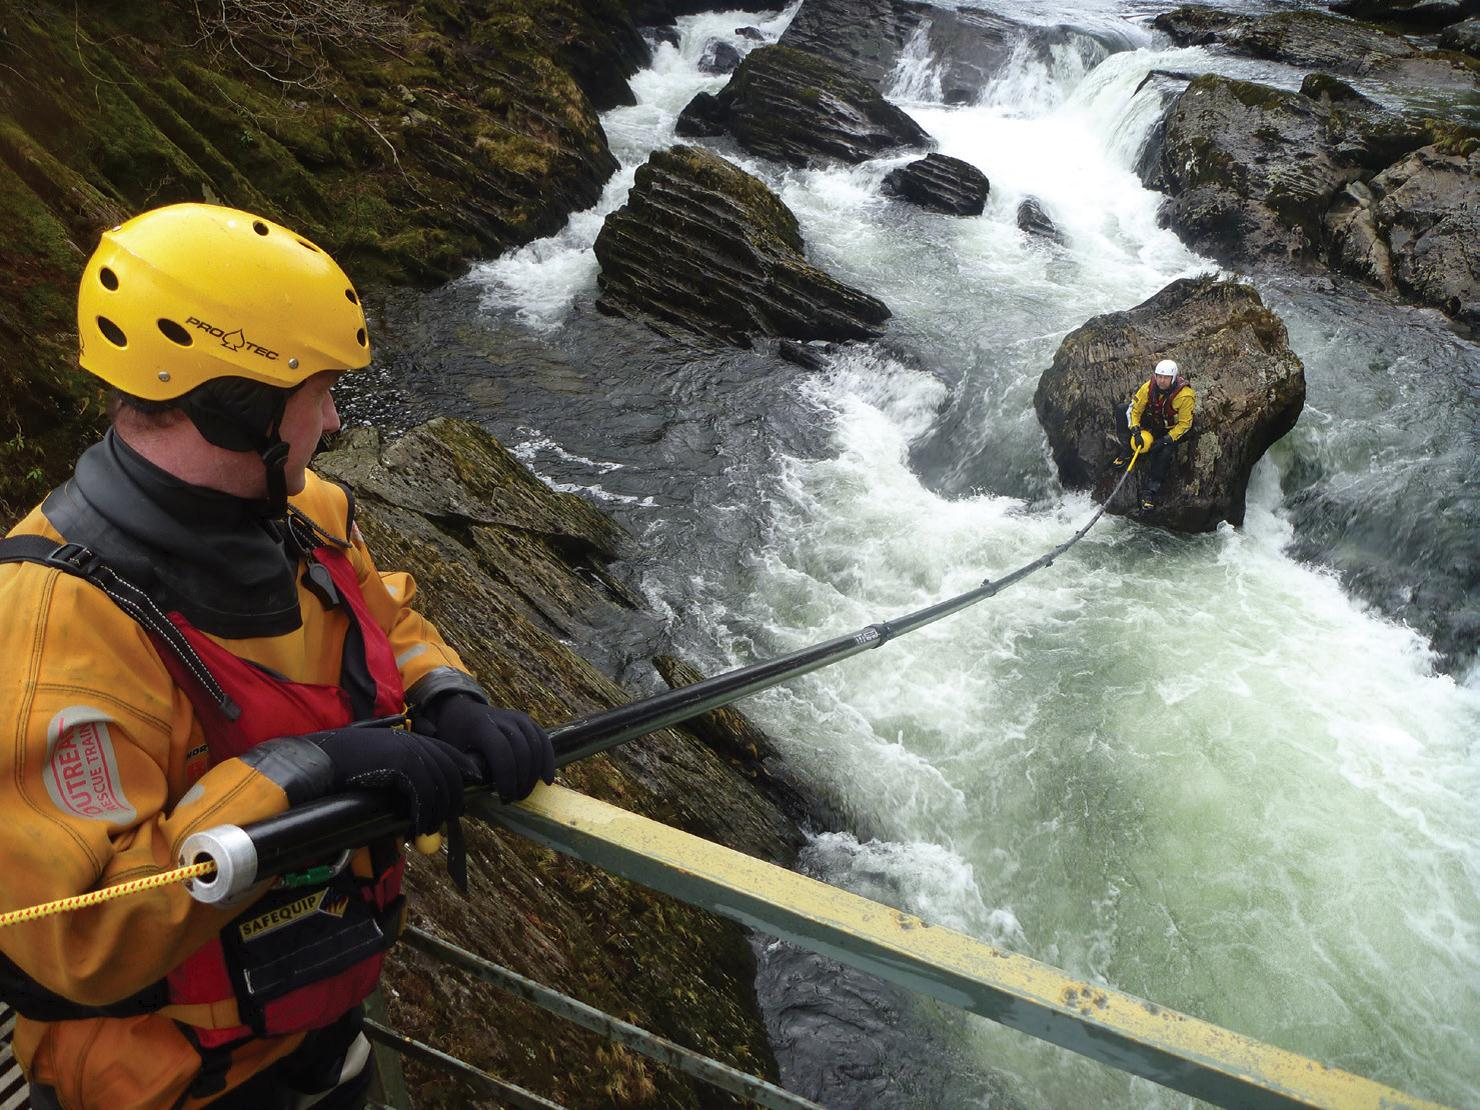 SG 300 Reach & Rescue study